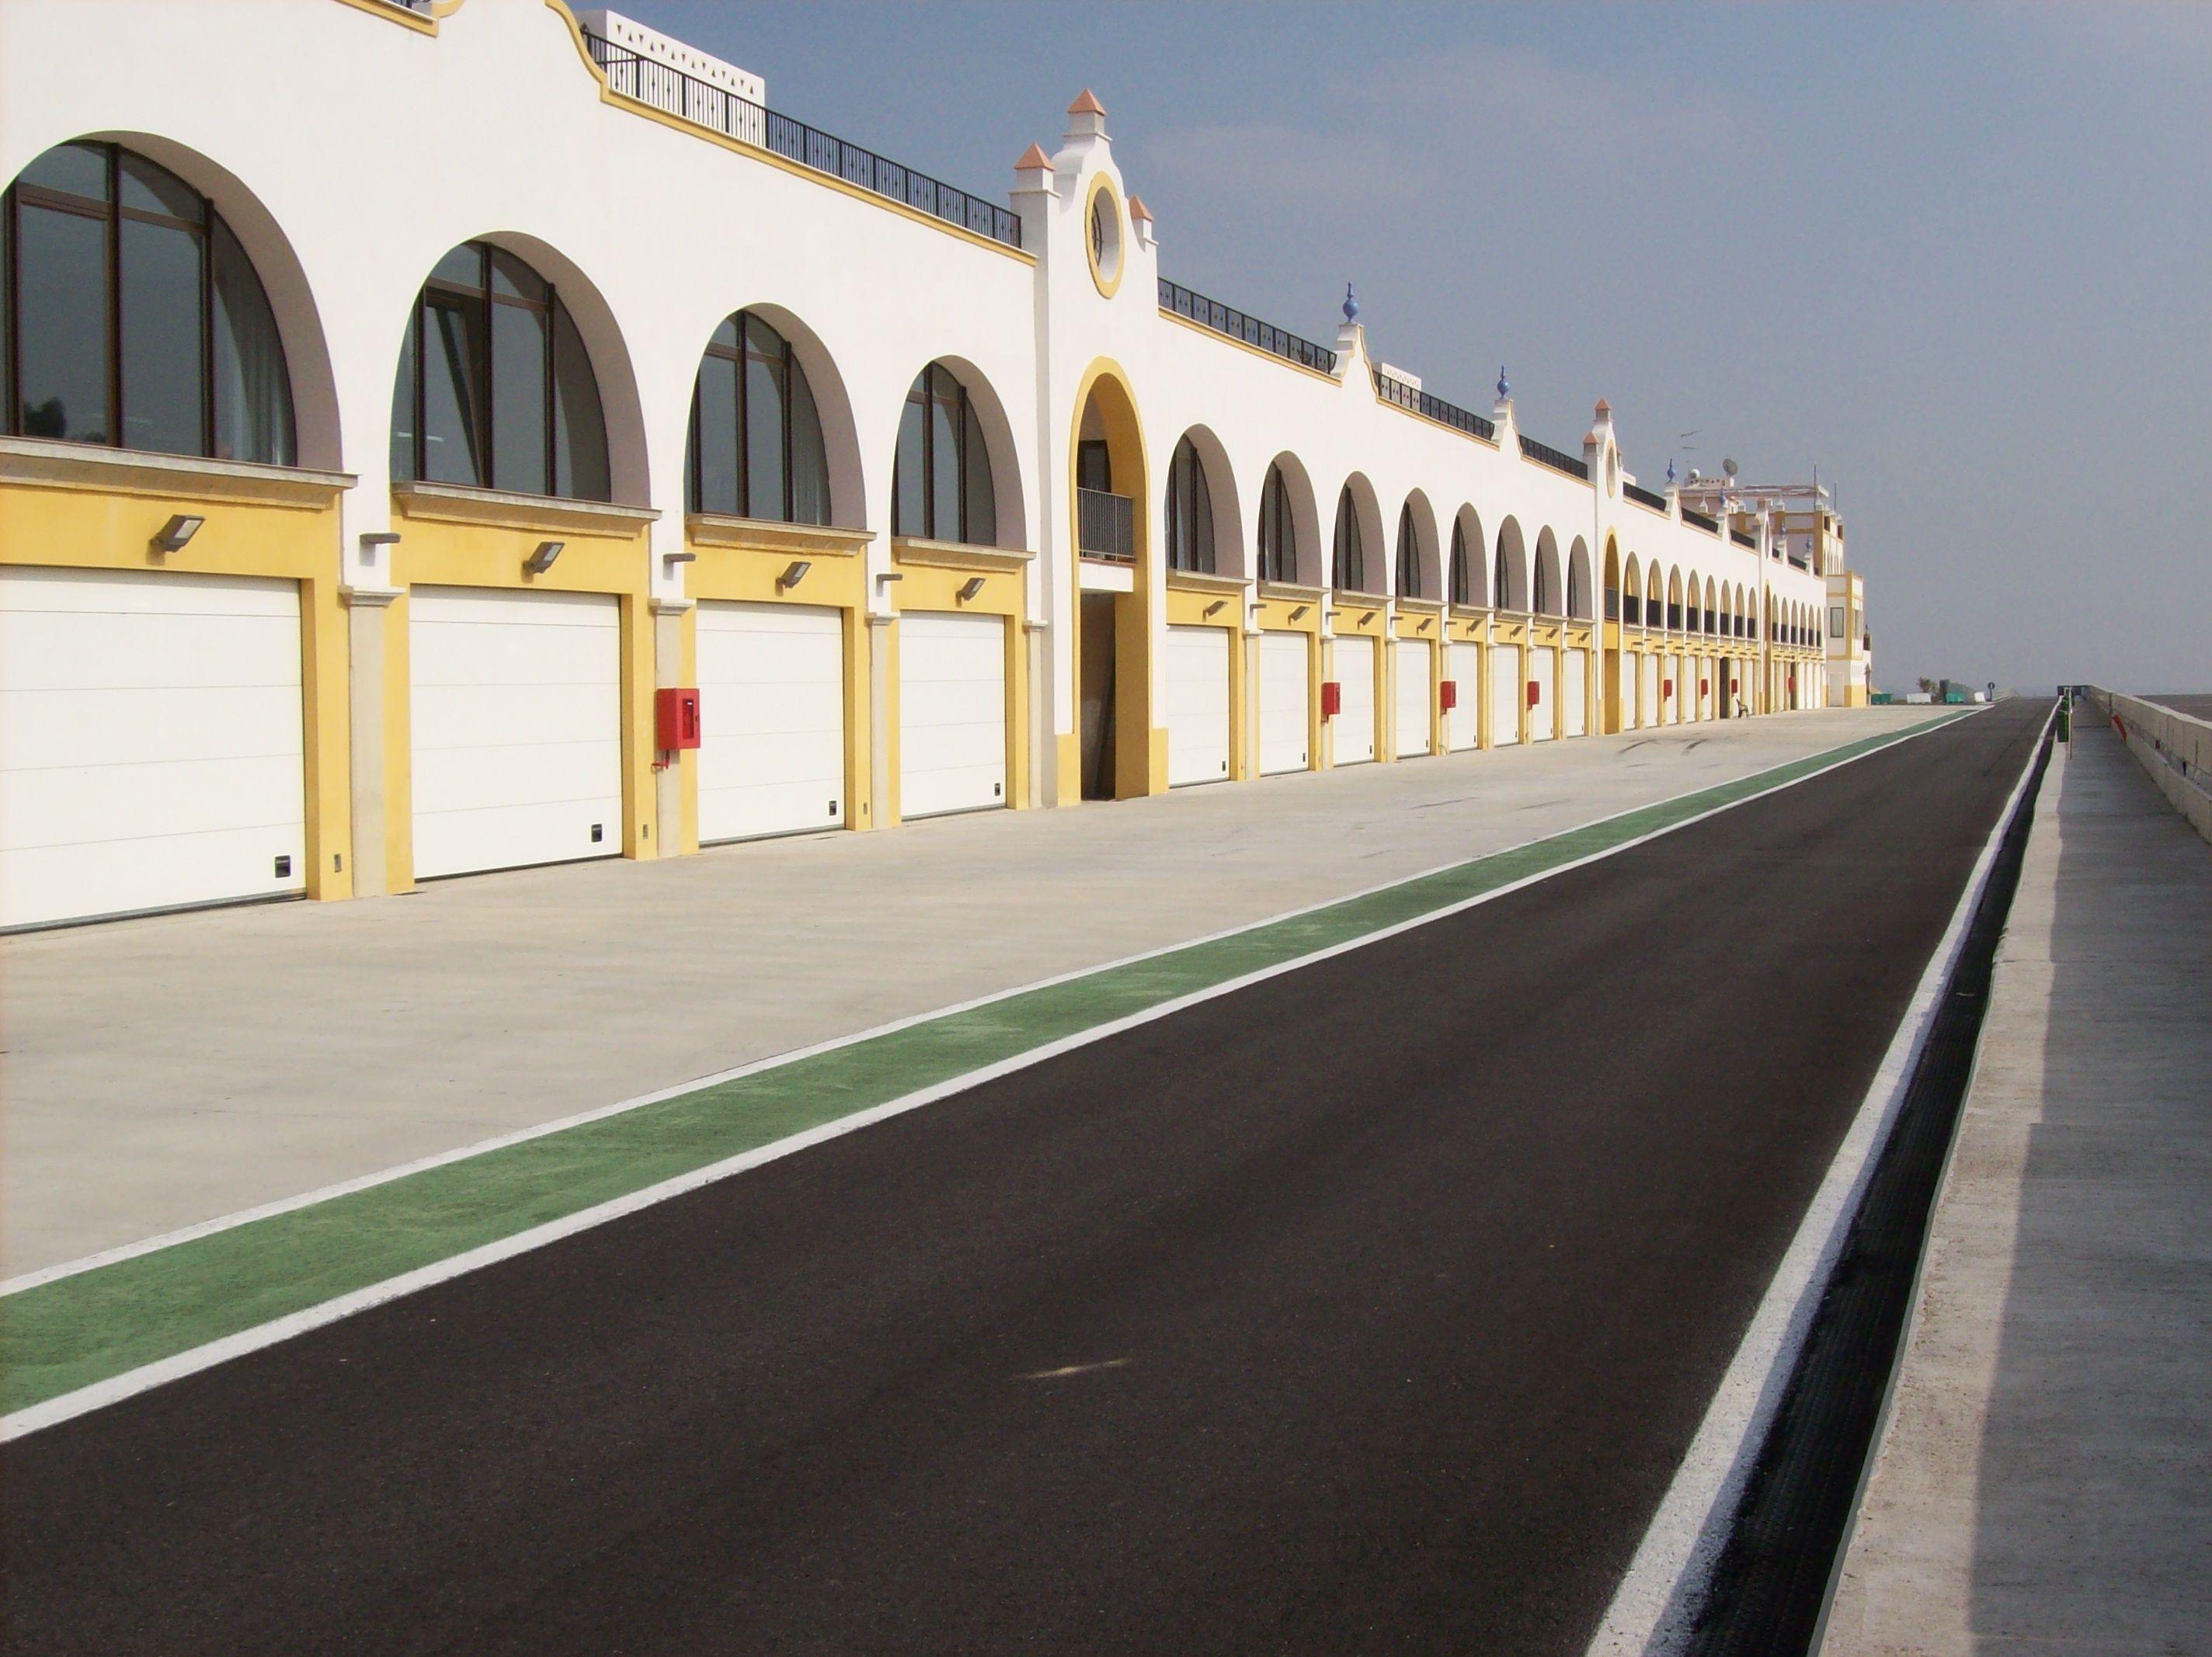 Circuito Monteblanco : Circuito monteblanco places i visited pinterest circuitos